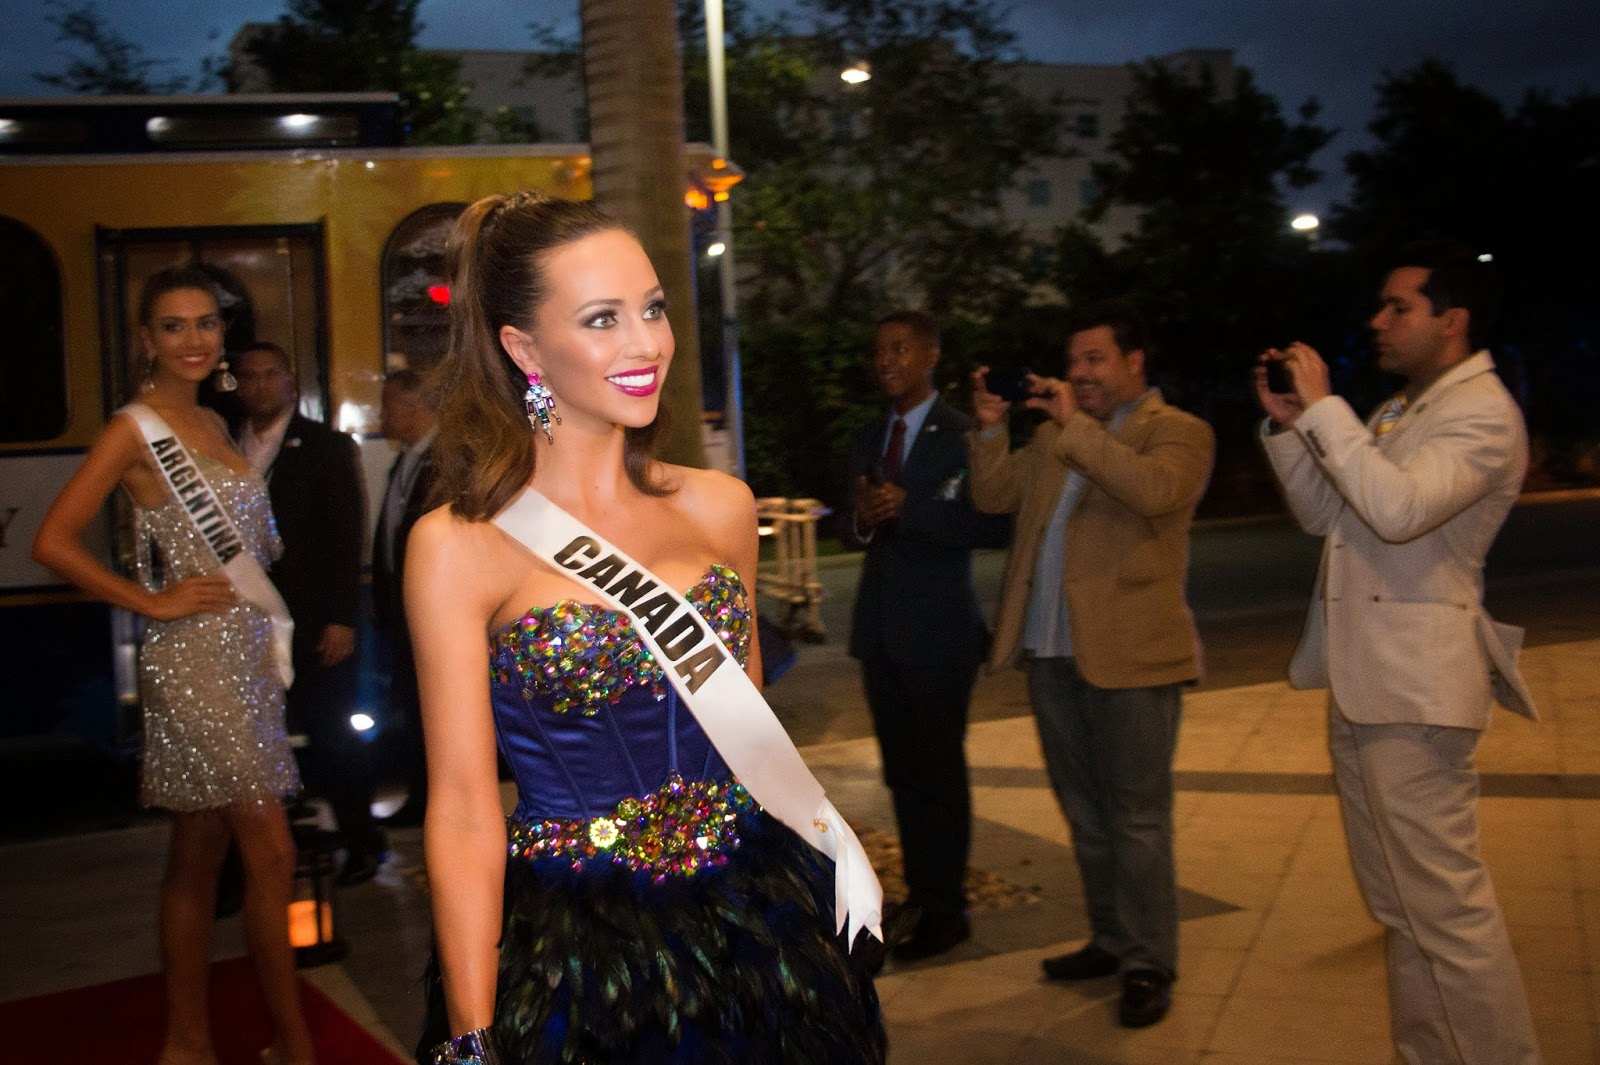 Miss Universe contestants at Harvest Delight Restaurant on